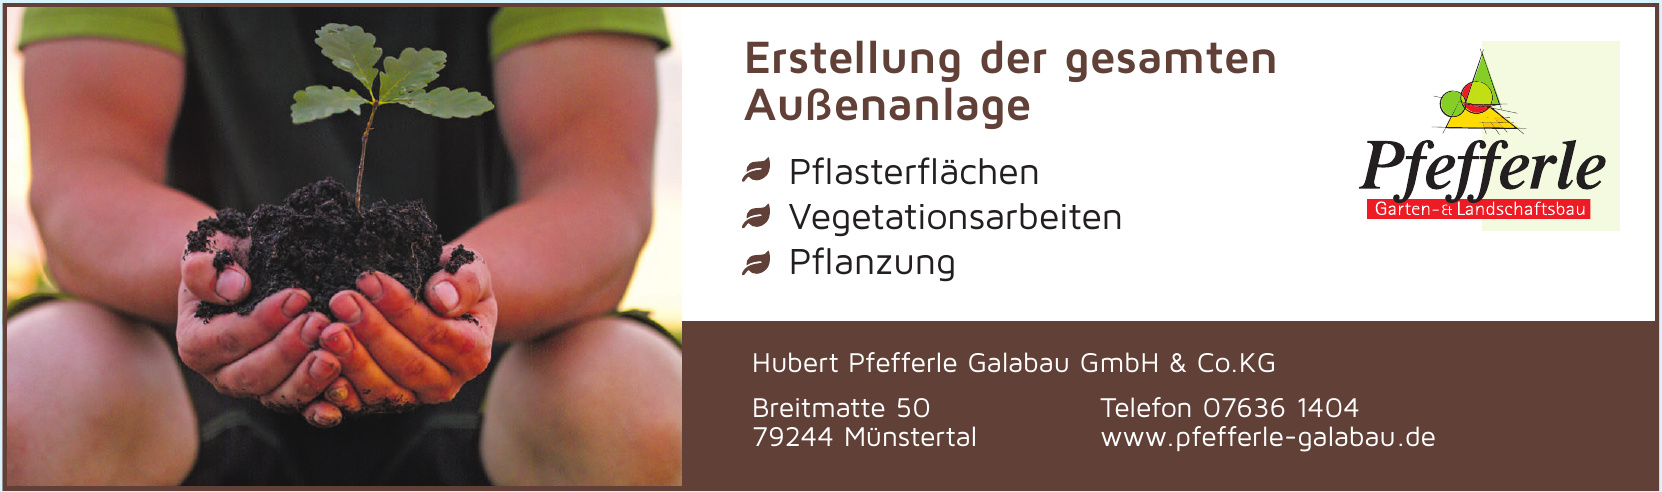 Hubert Pfefferle Galabau GmbH & Co.KG